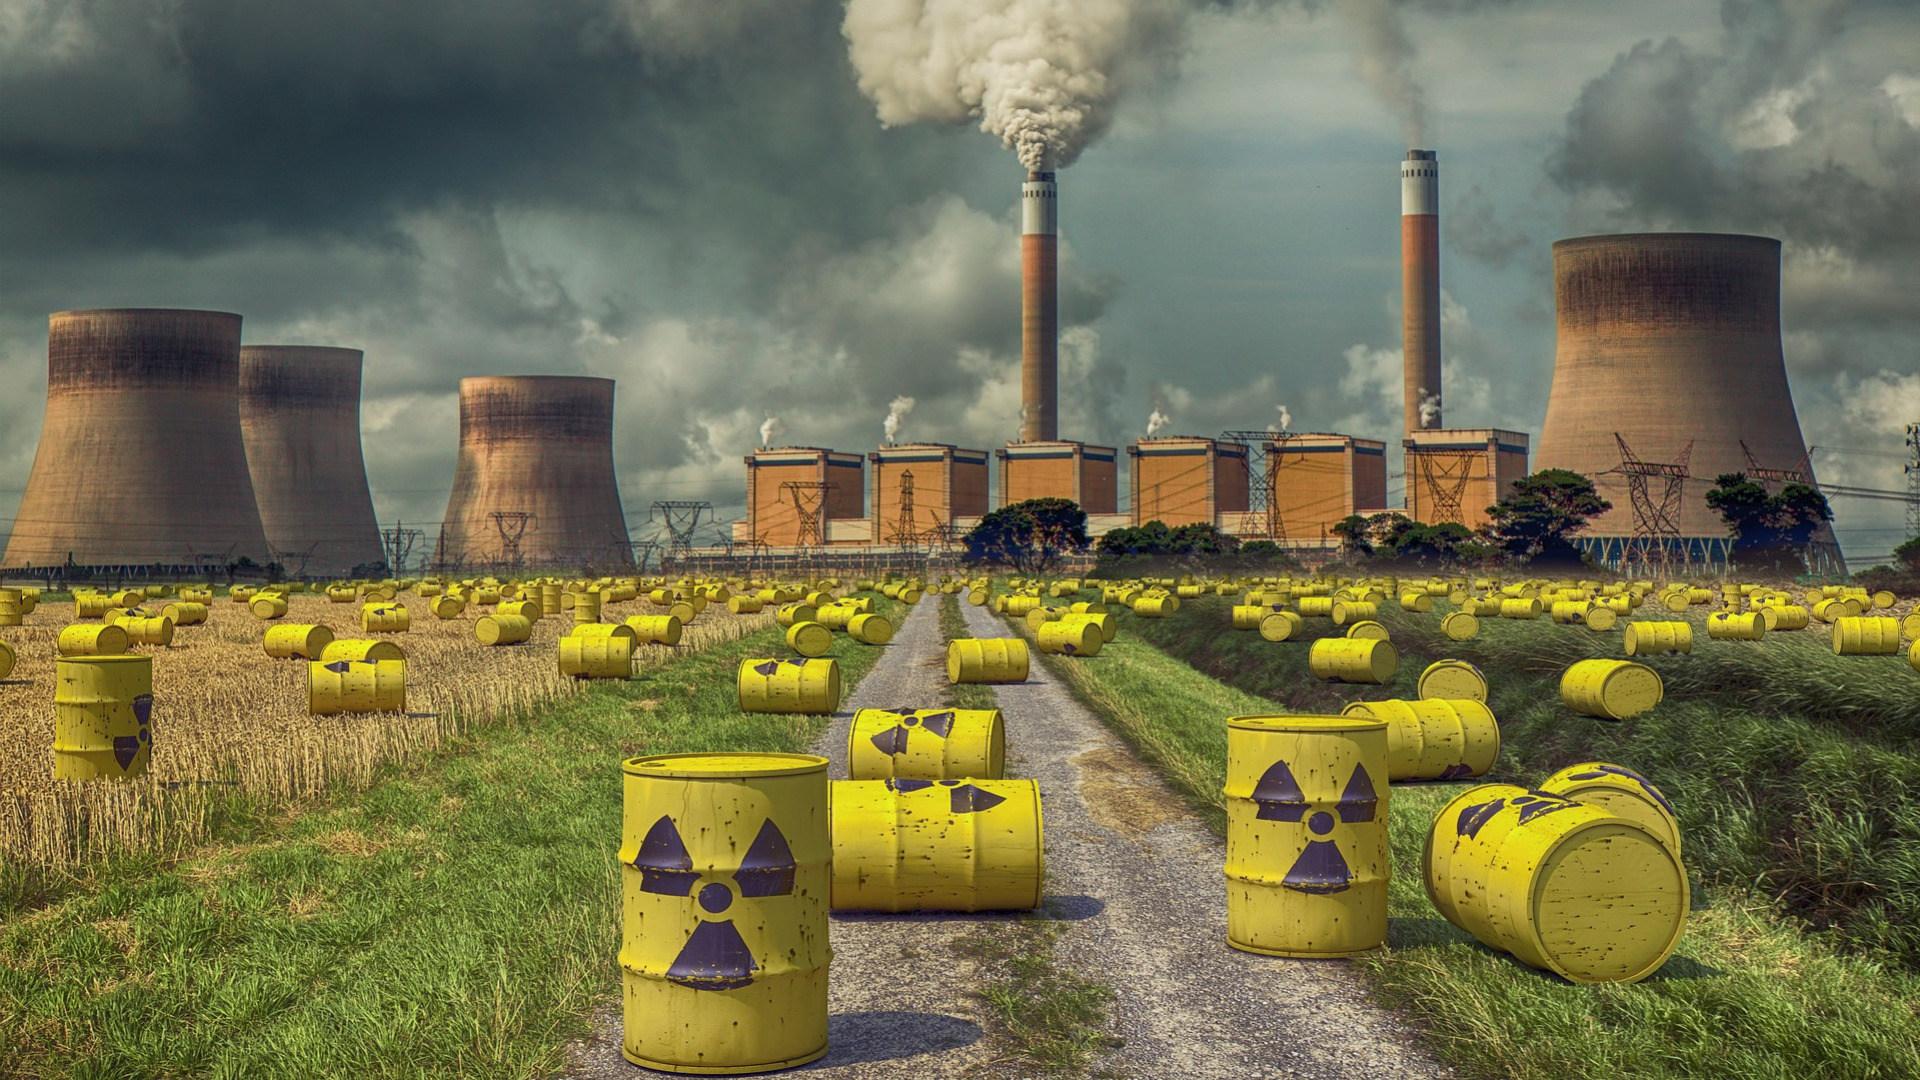 Atomkraftwerk, Atomkraft, Nuklear, Atommüll